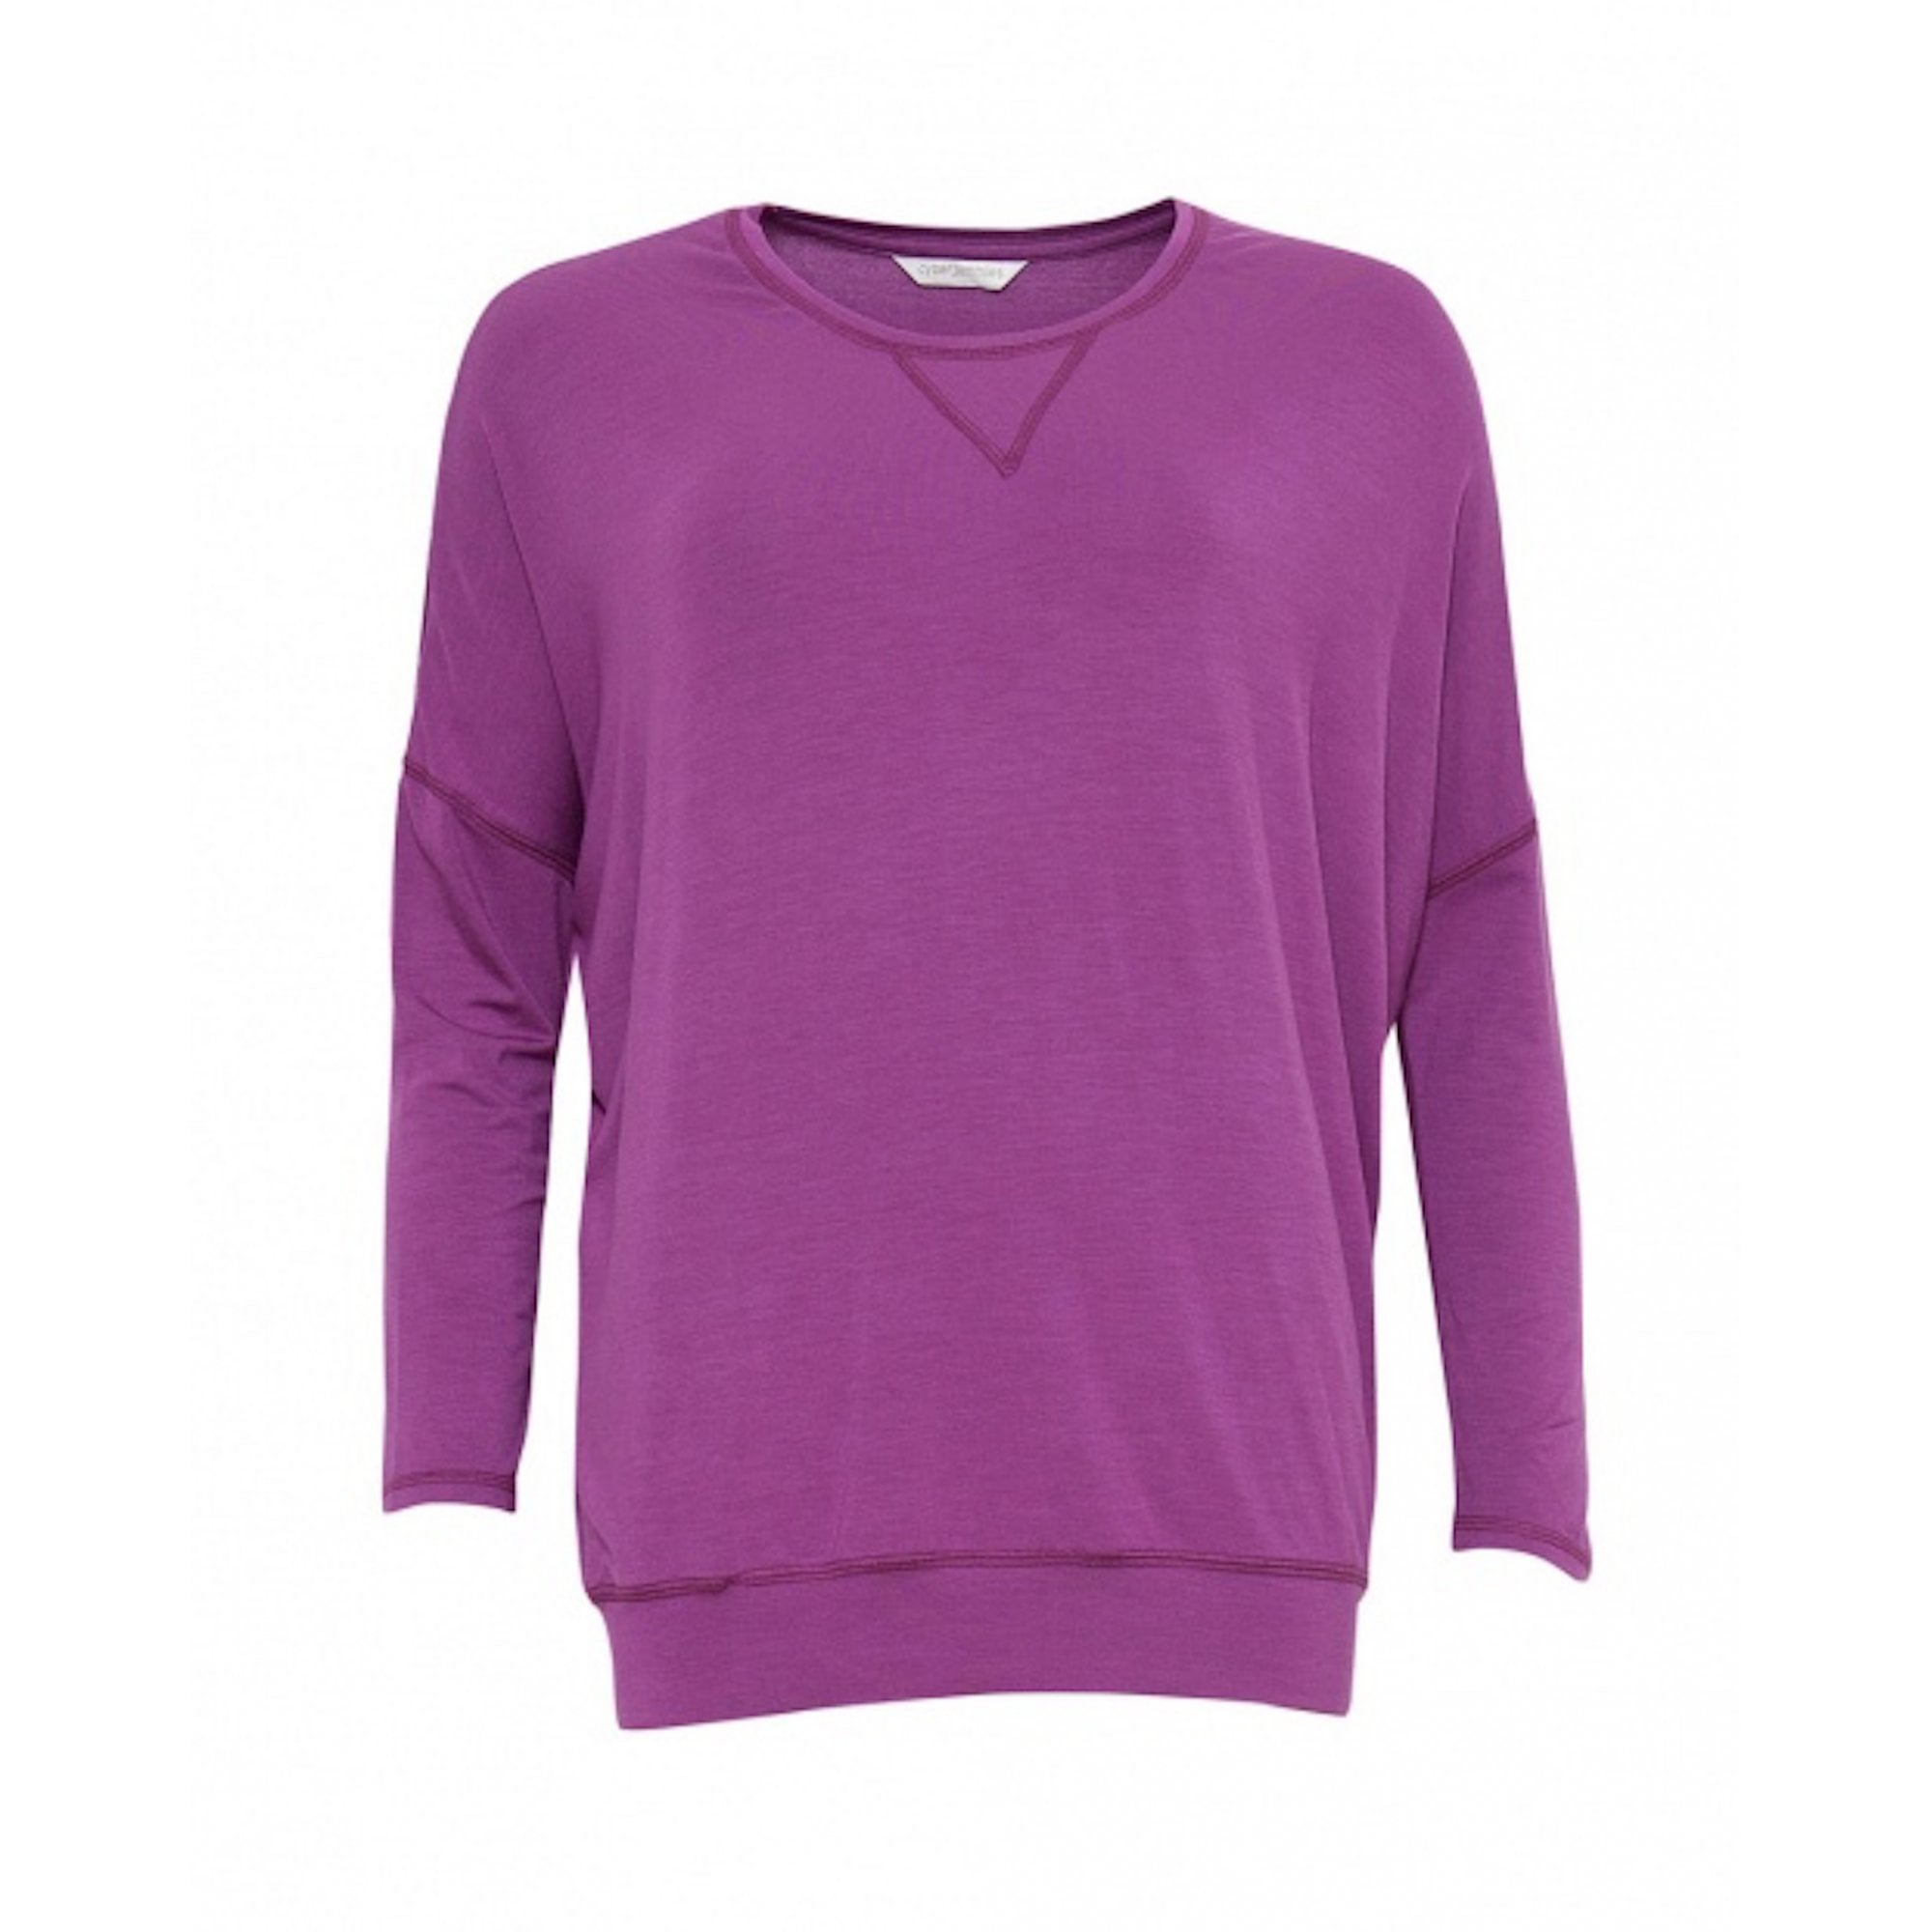 Cyberjammies Fiona Long Sleeve Knit Pyjama Top